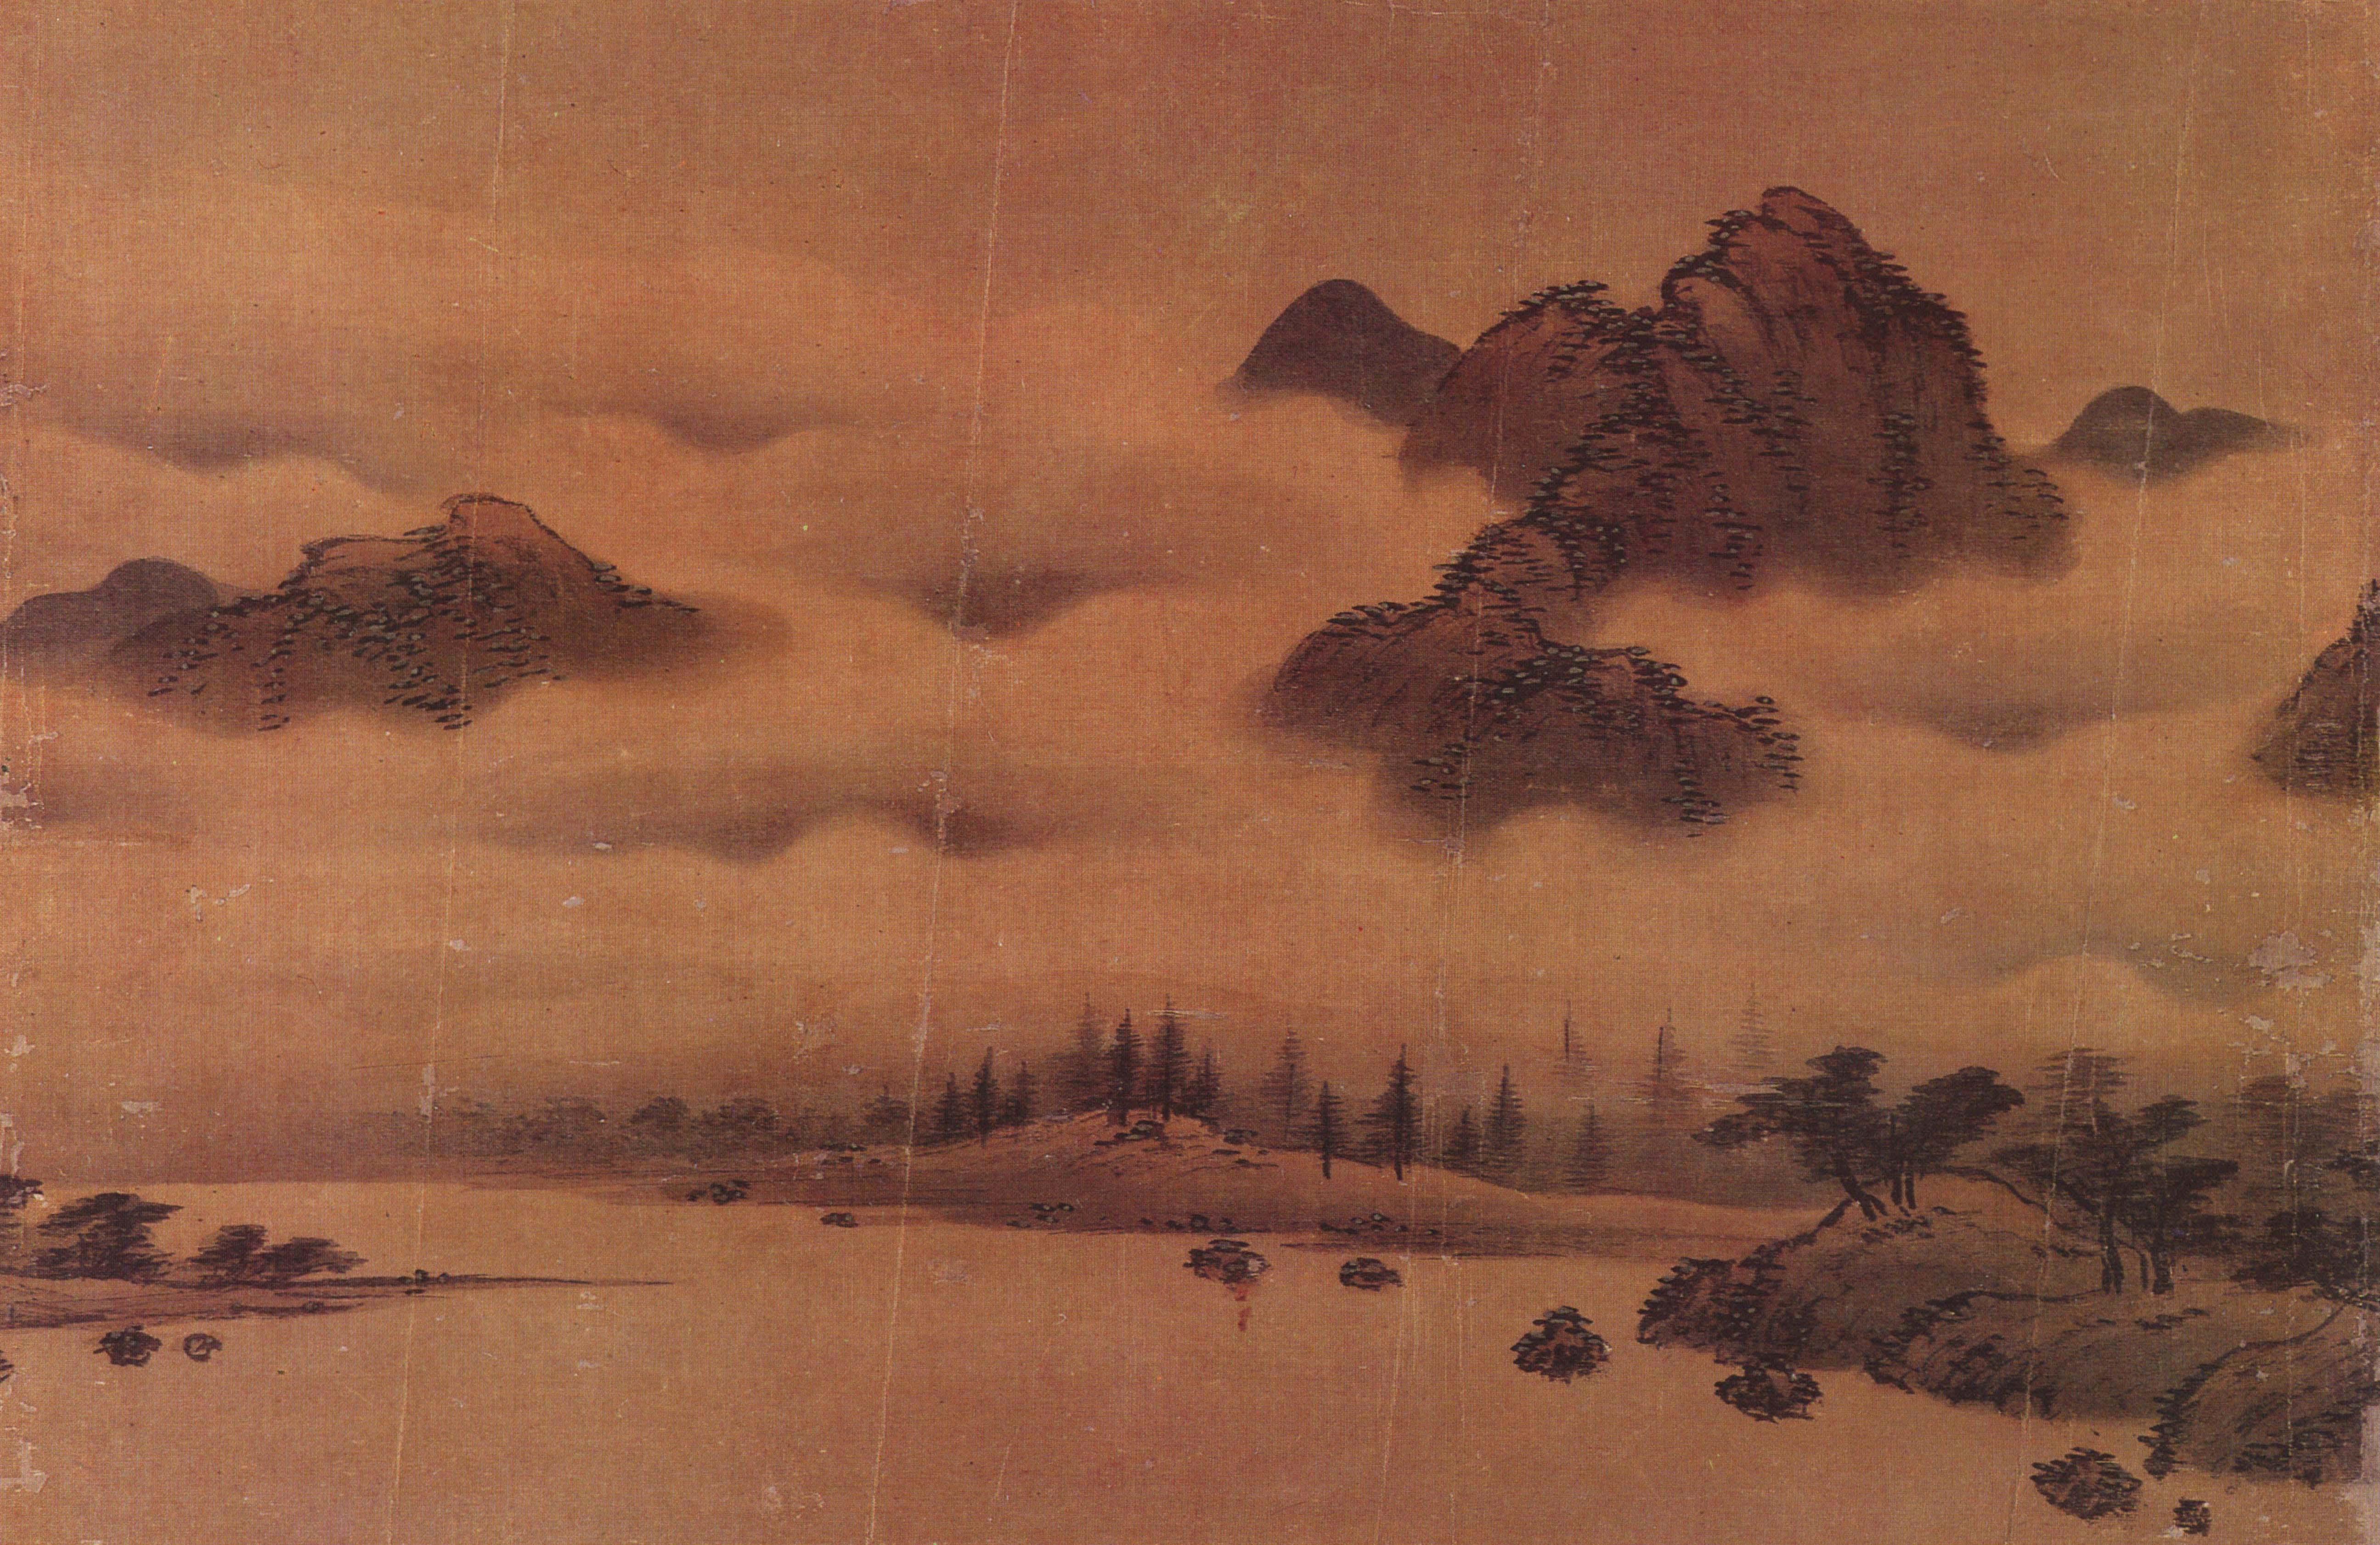 File:서문보 산수도(山水圖) 15세기